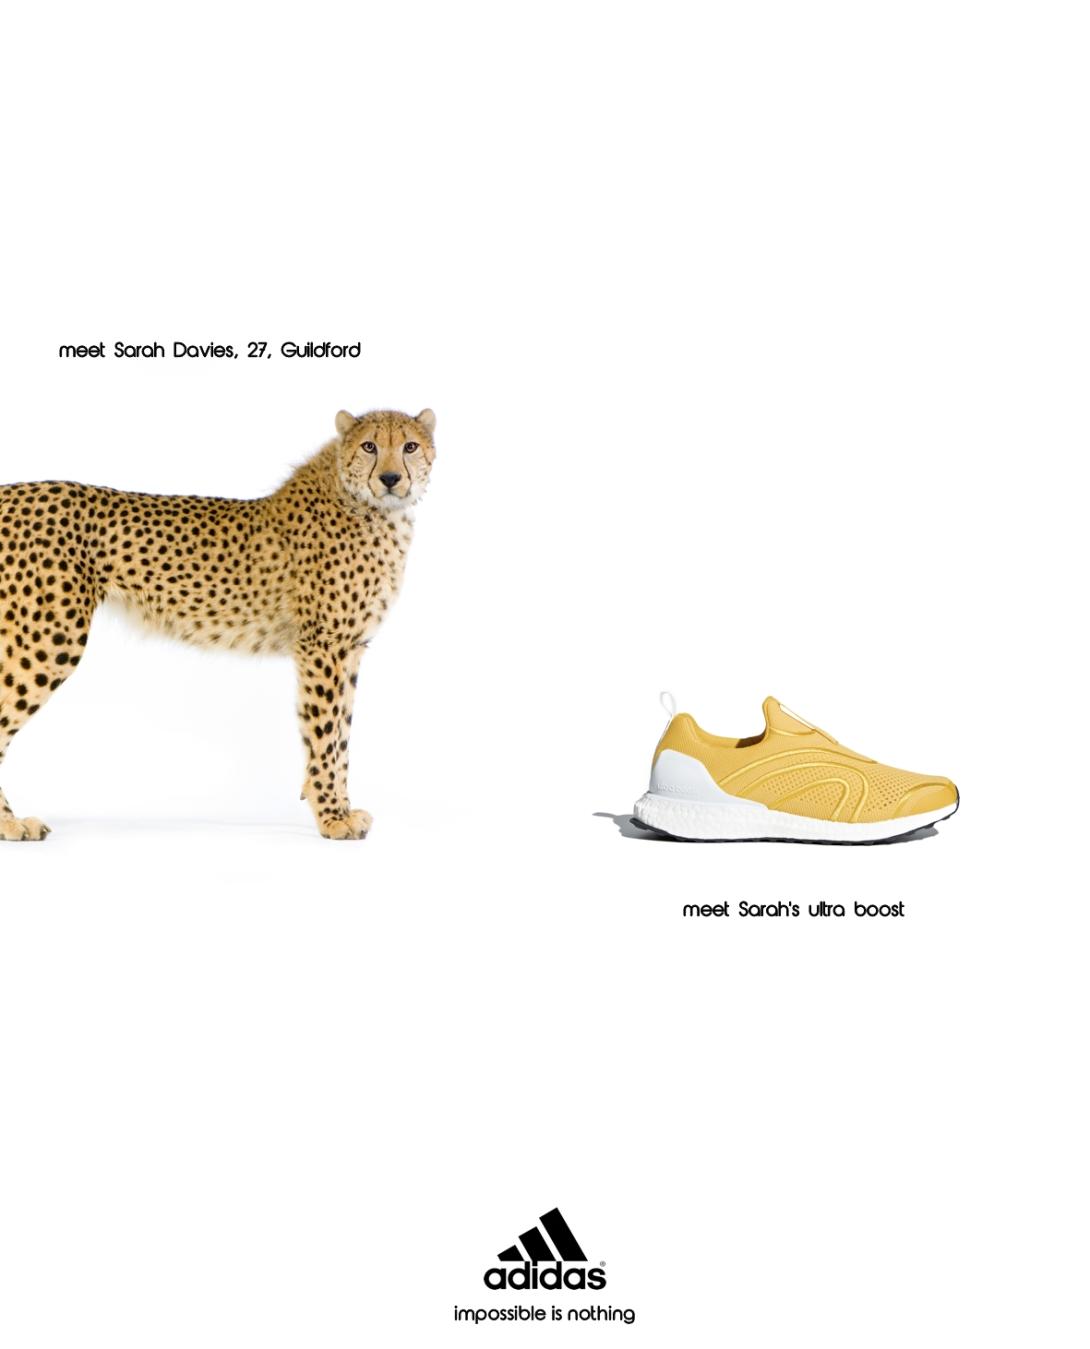 advertising concept for a running shoe brand - sarah davies, cheetah